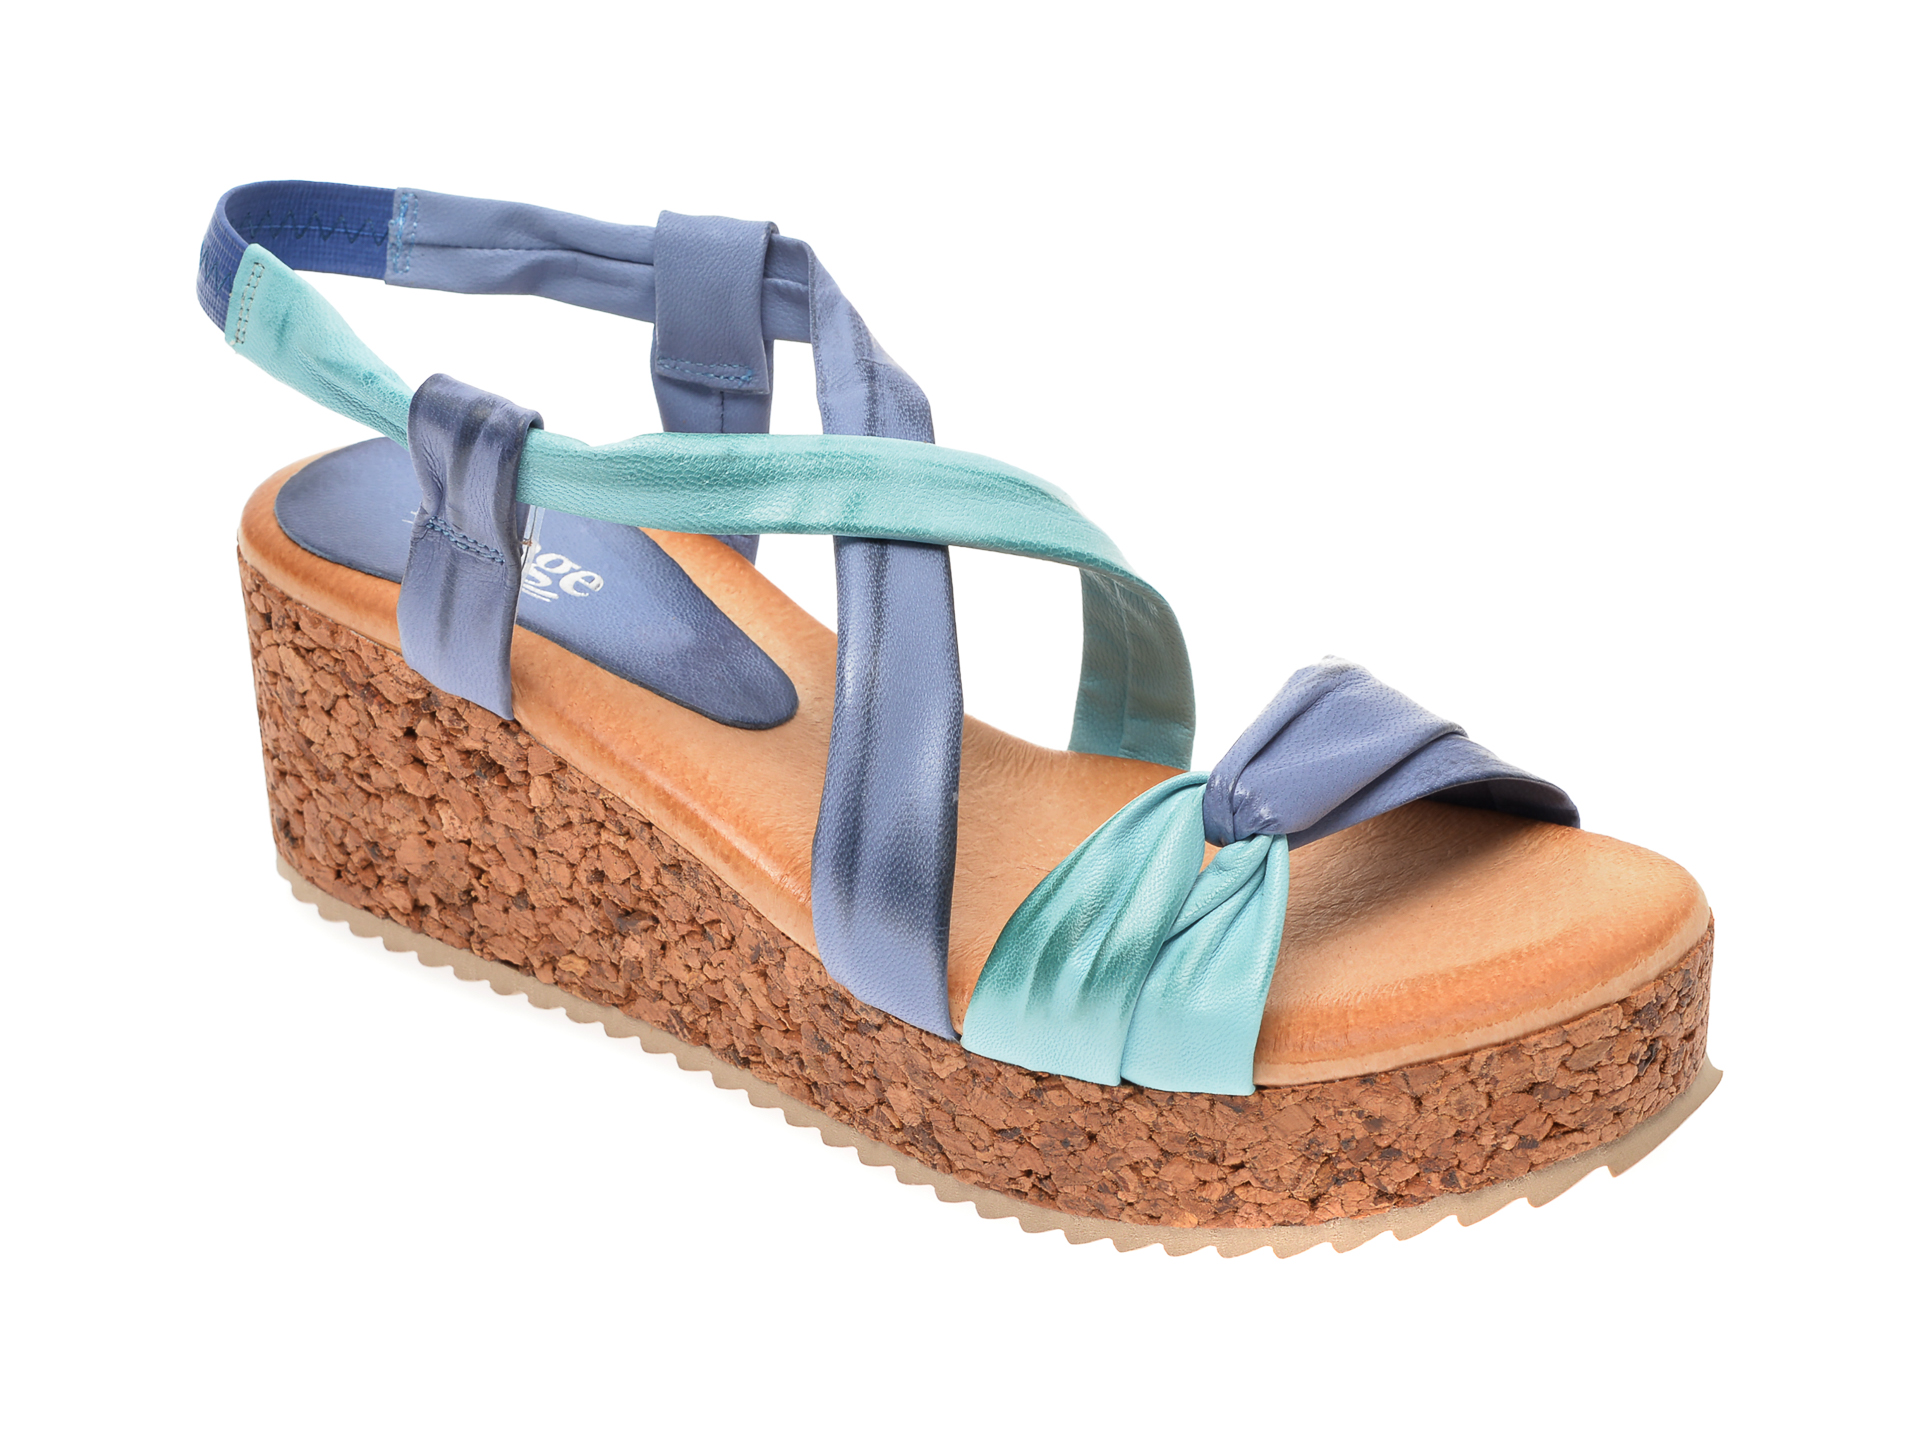 Sandale IMAGE albastre, 1059, din piele naturala